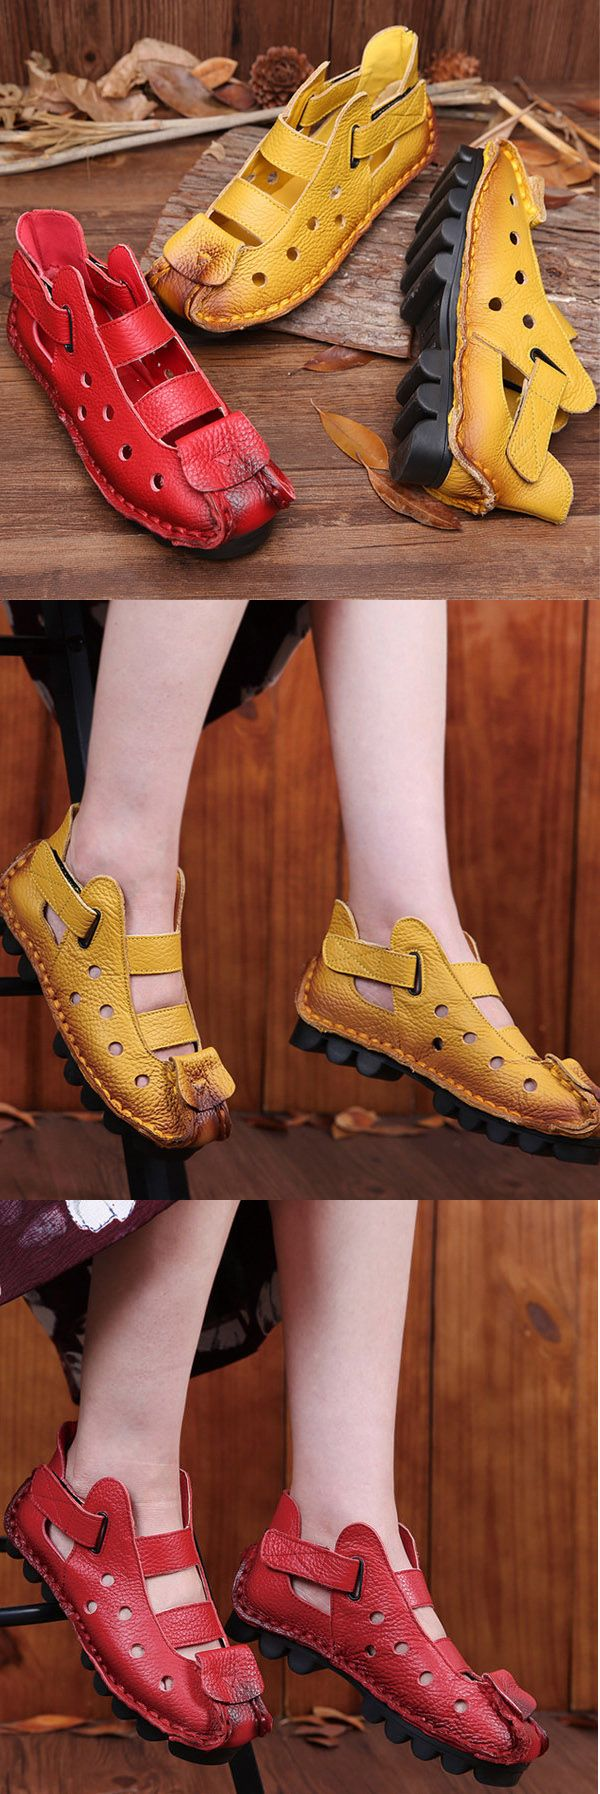 Keno Running Shoes